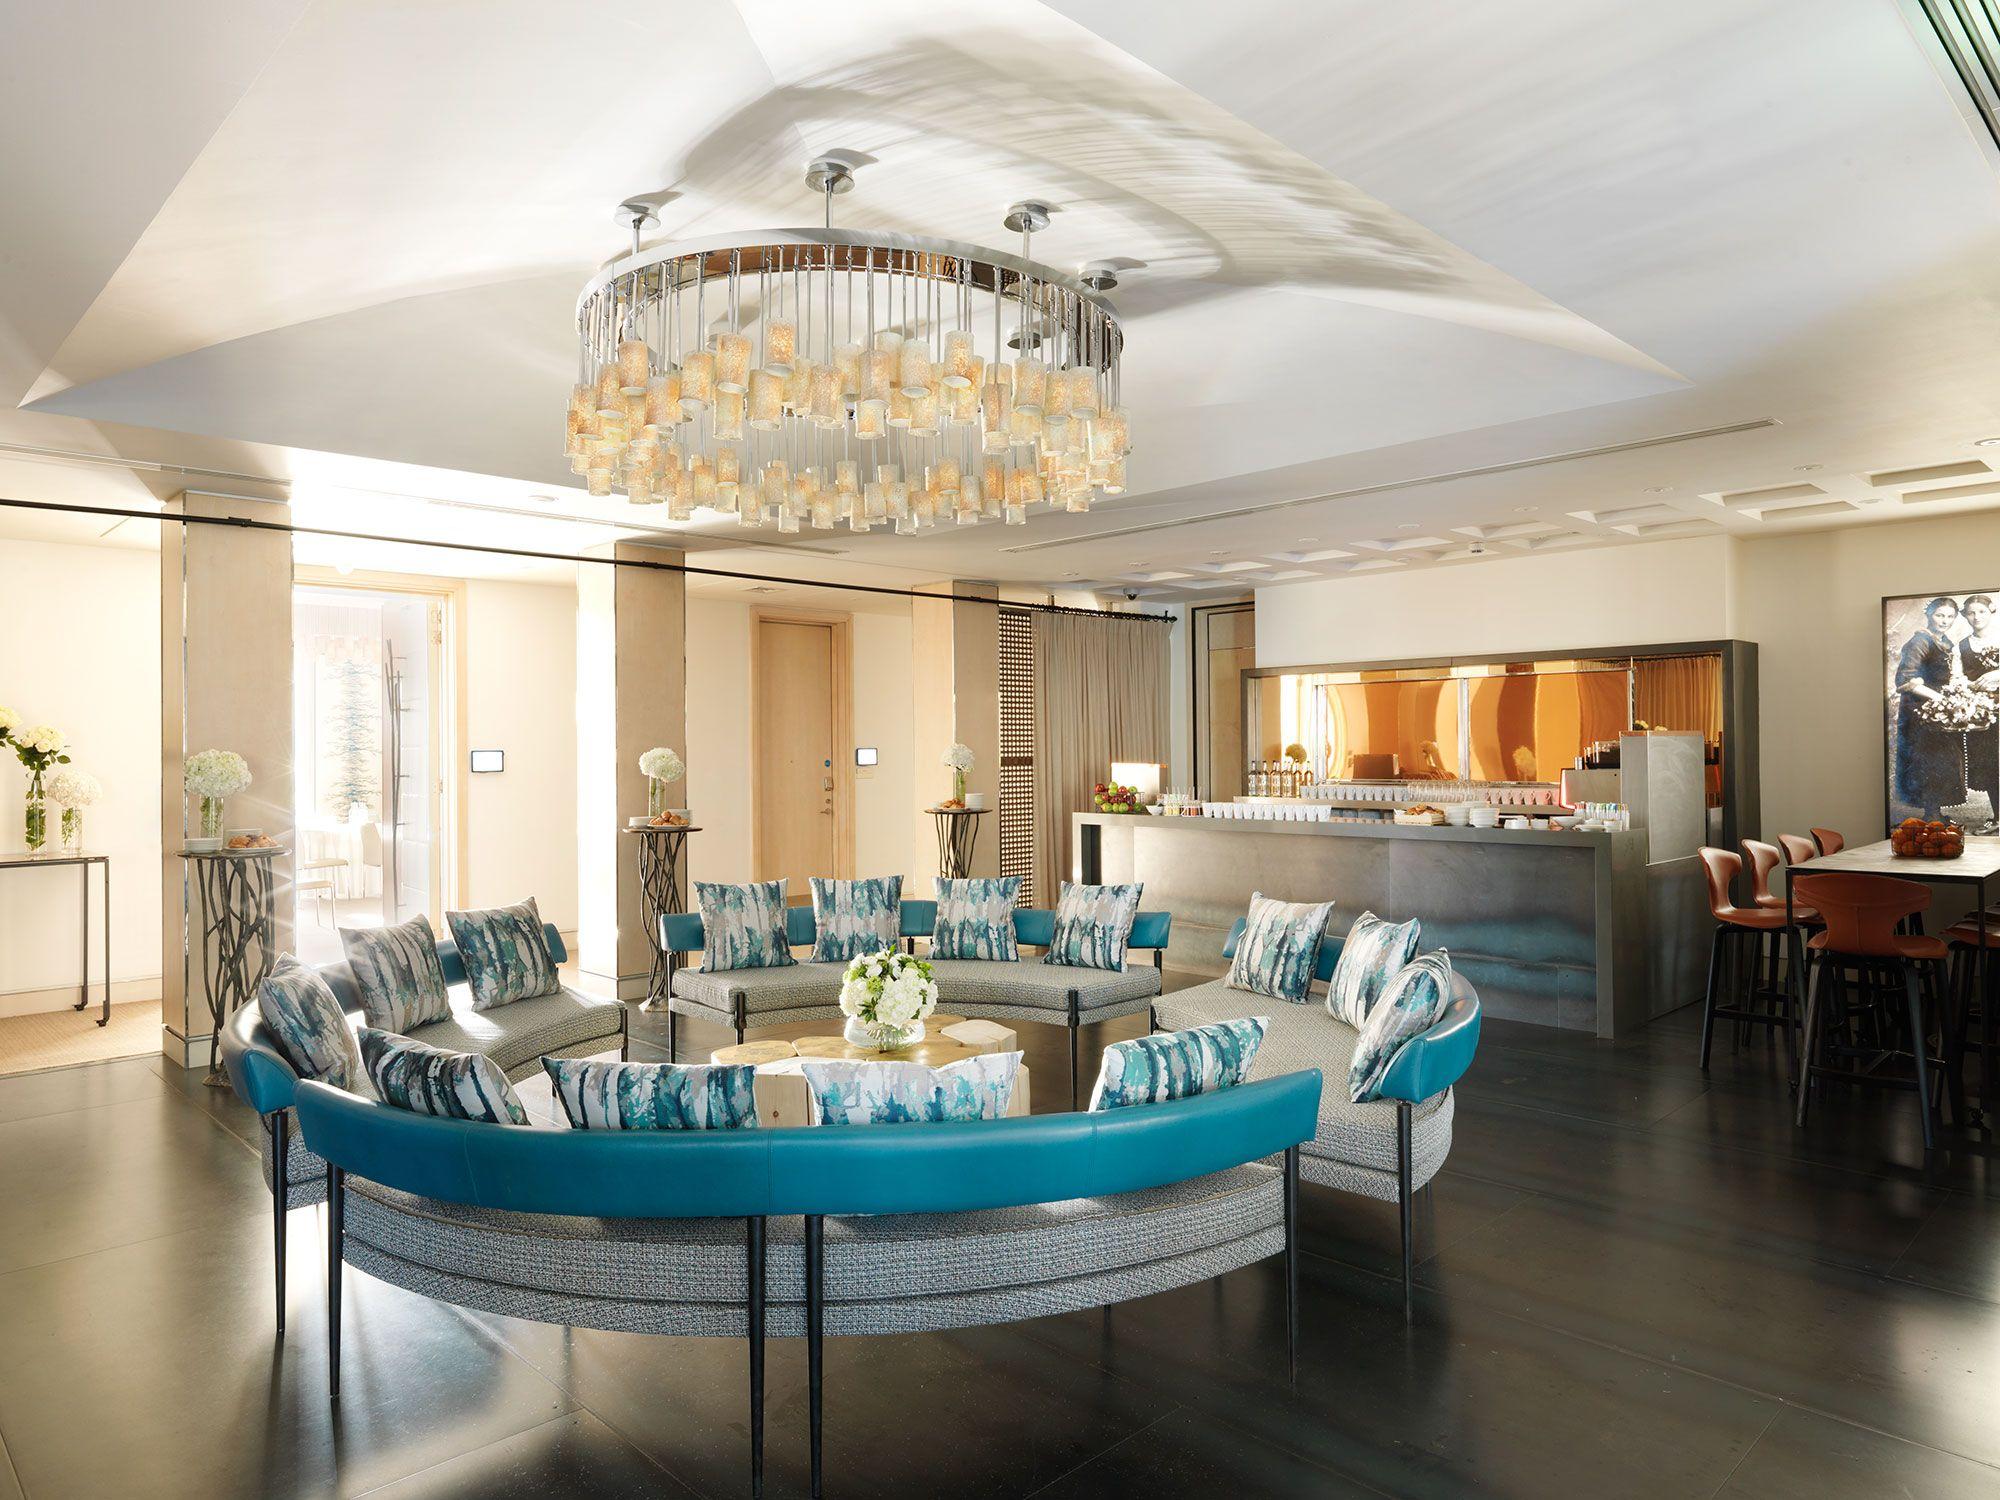 Luxury Hertfordshire Hotel Golf Resort And Spa The Grove Hotel